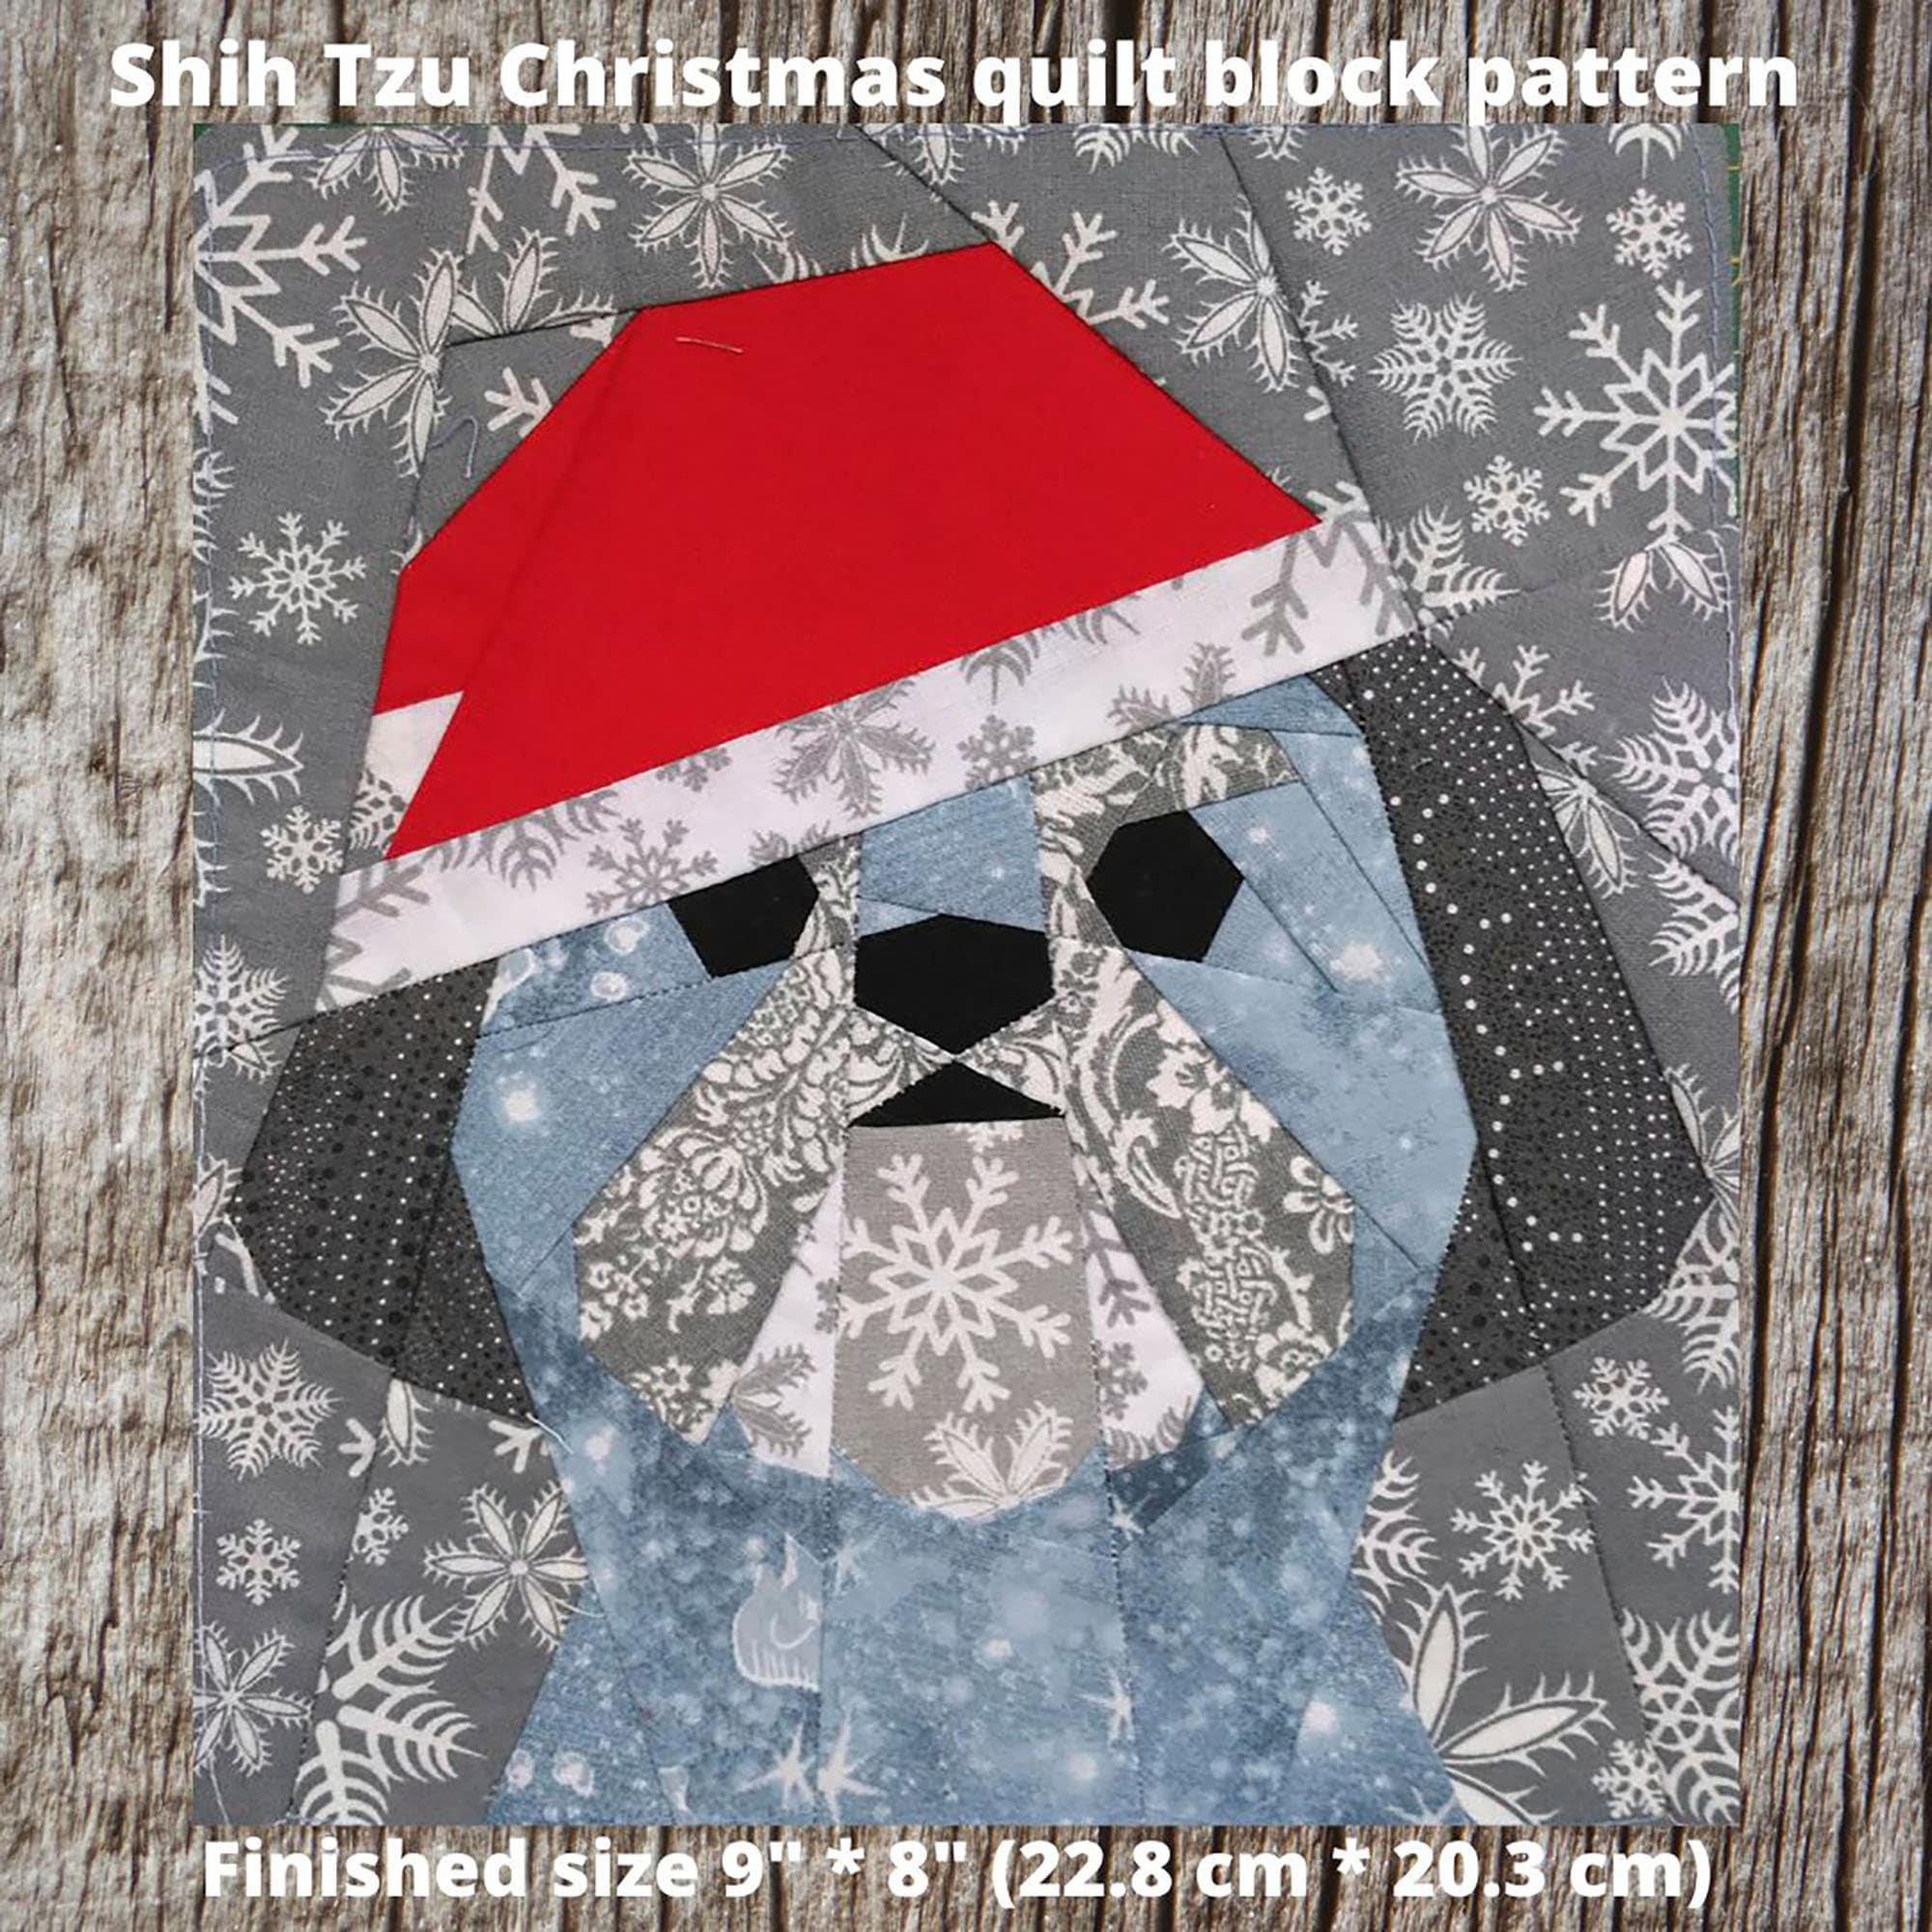 Shih Tzu Christmas quilt block pattern | Etsy